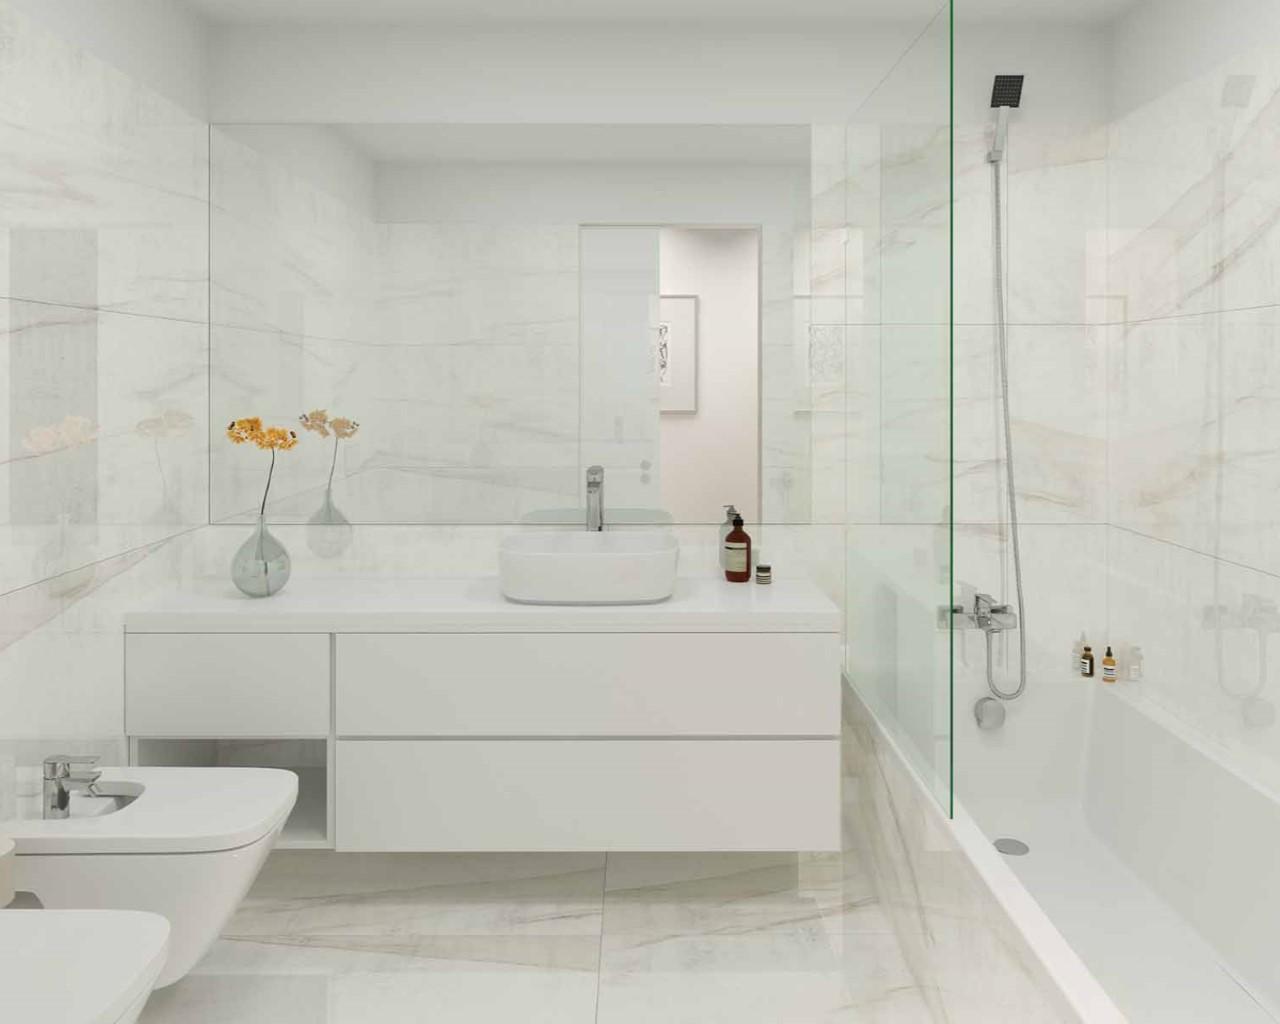 Lux Garden - Salle de bain - option ville